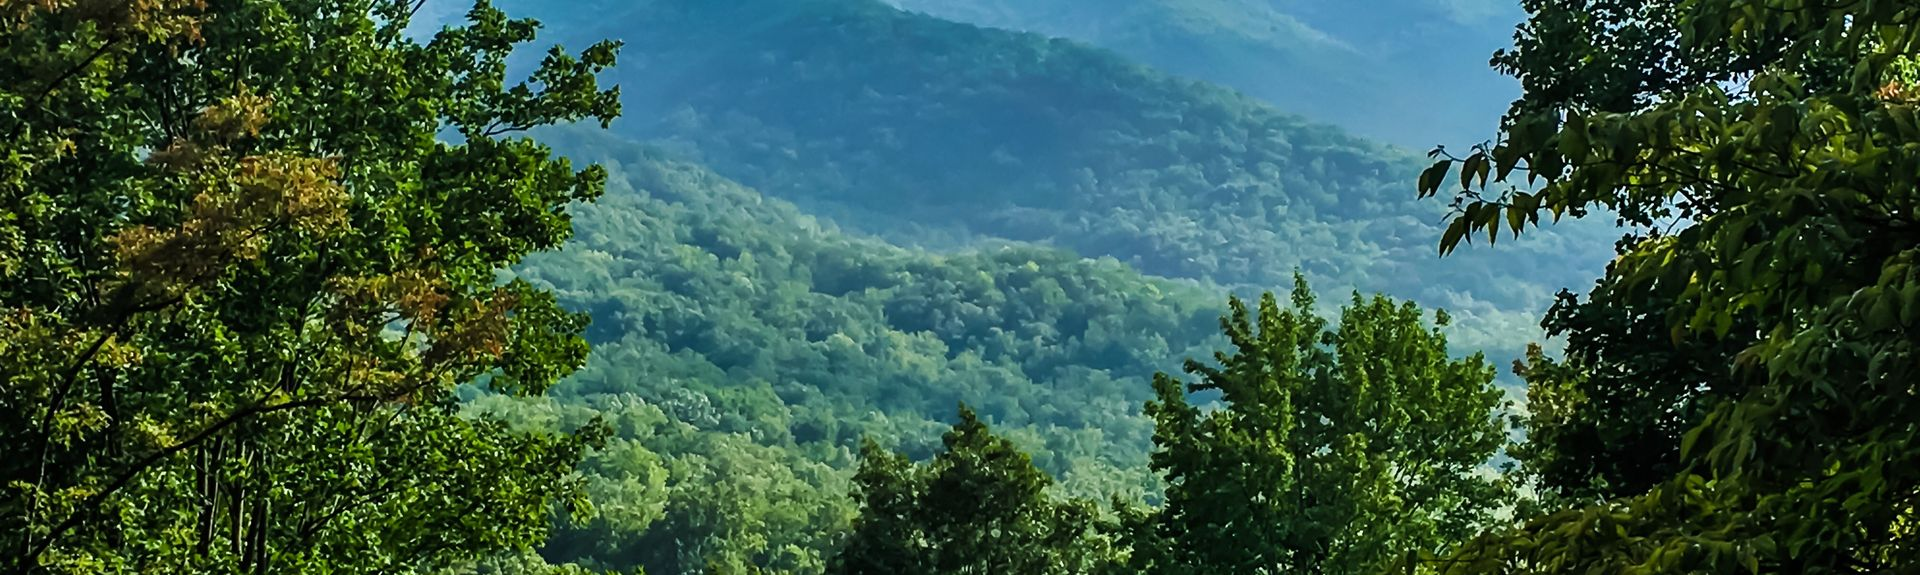 Henderson County, North Carolina, United States of America